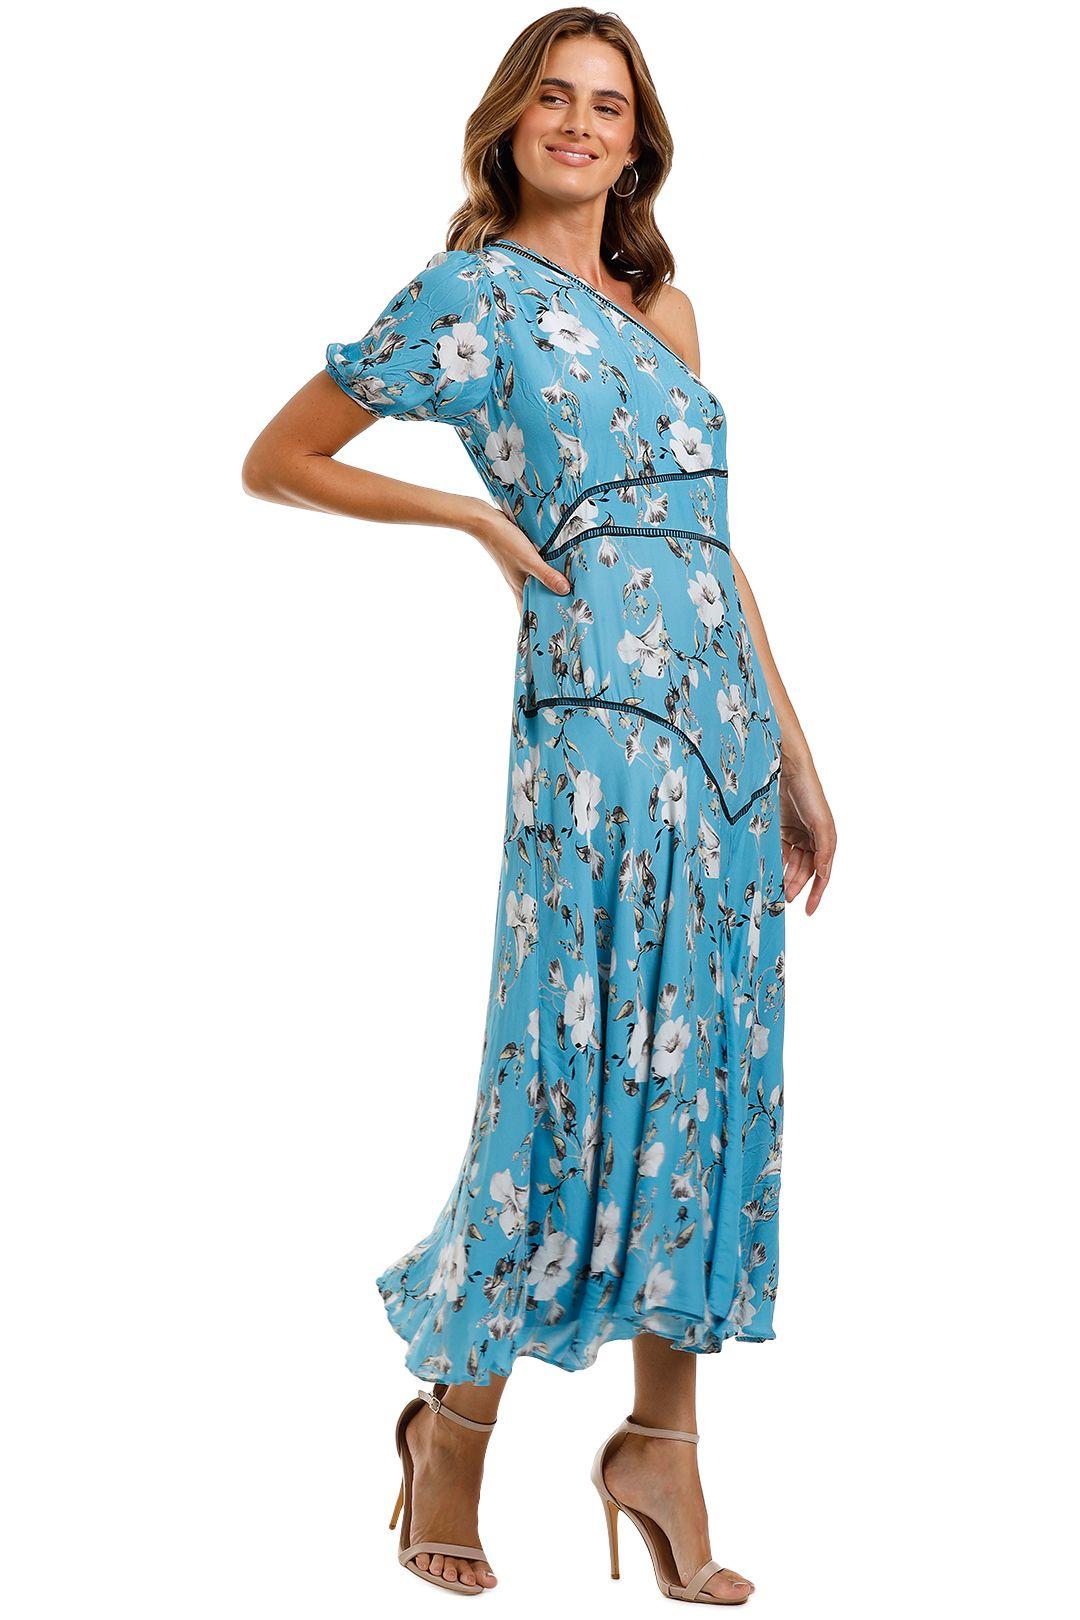 Talulah Cannes Midi Dress Blue Valentine Floral